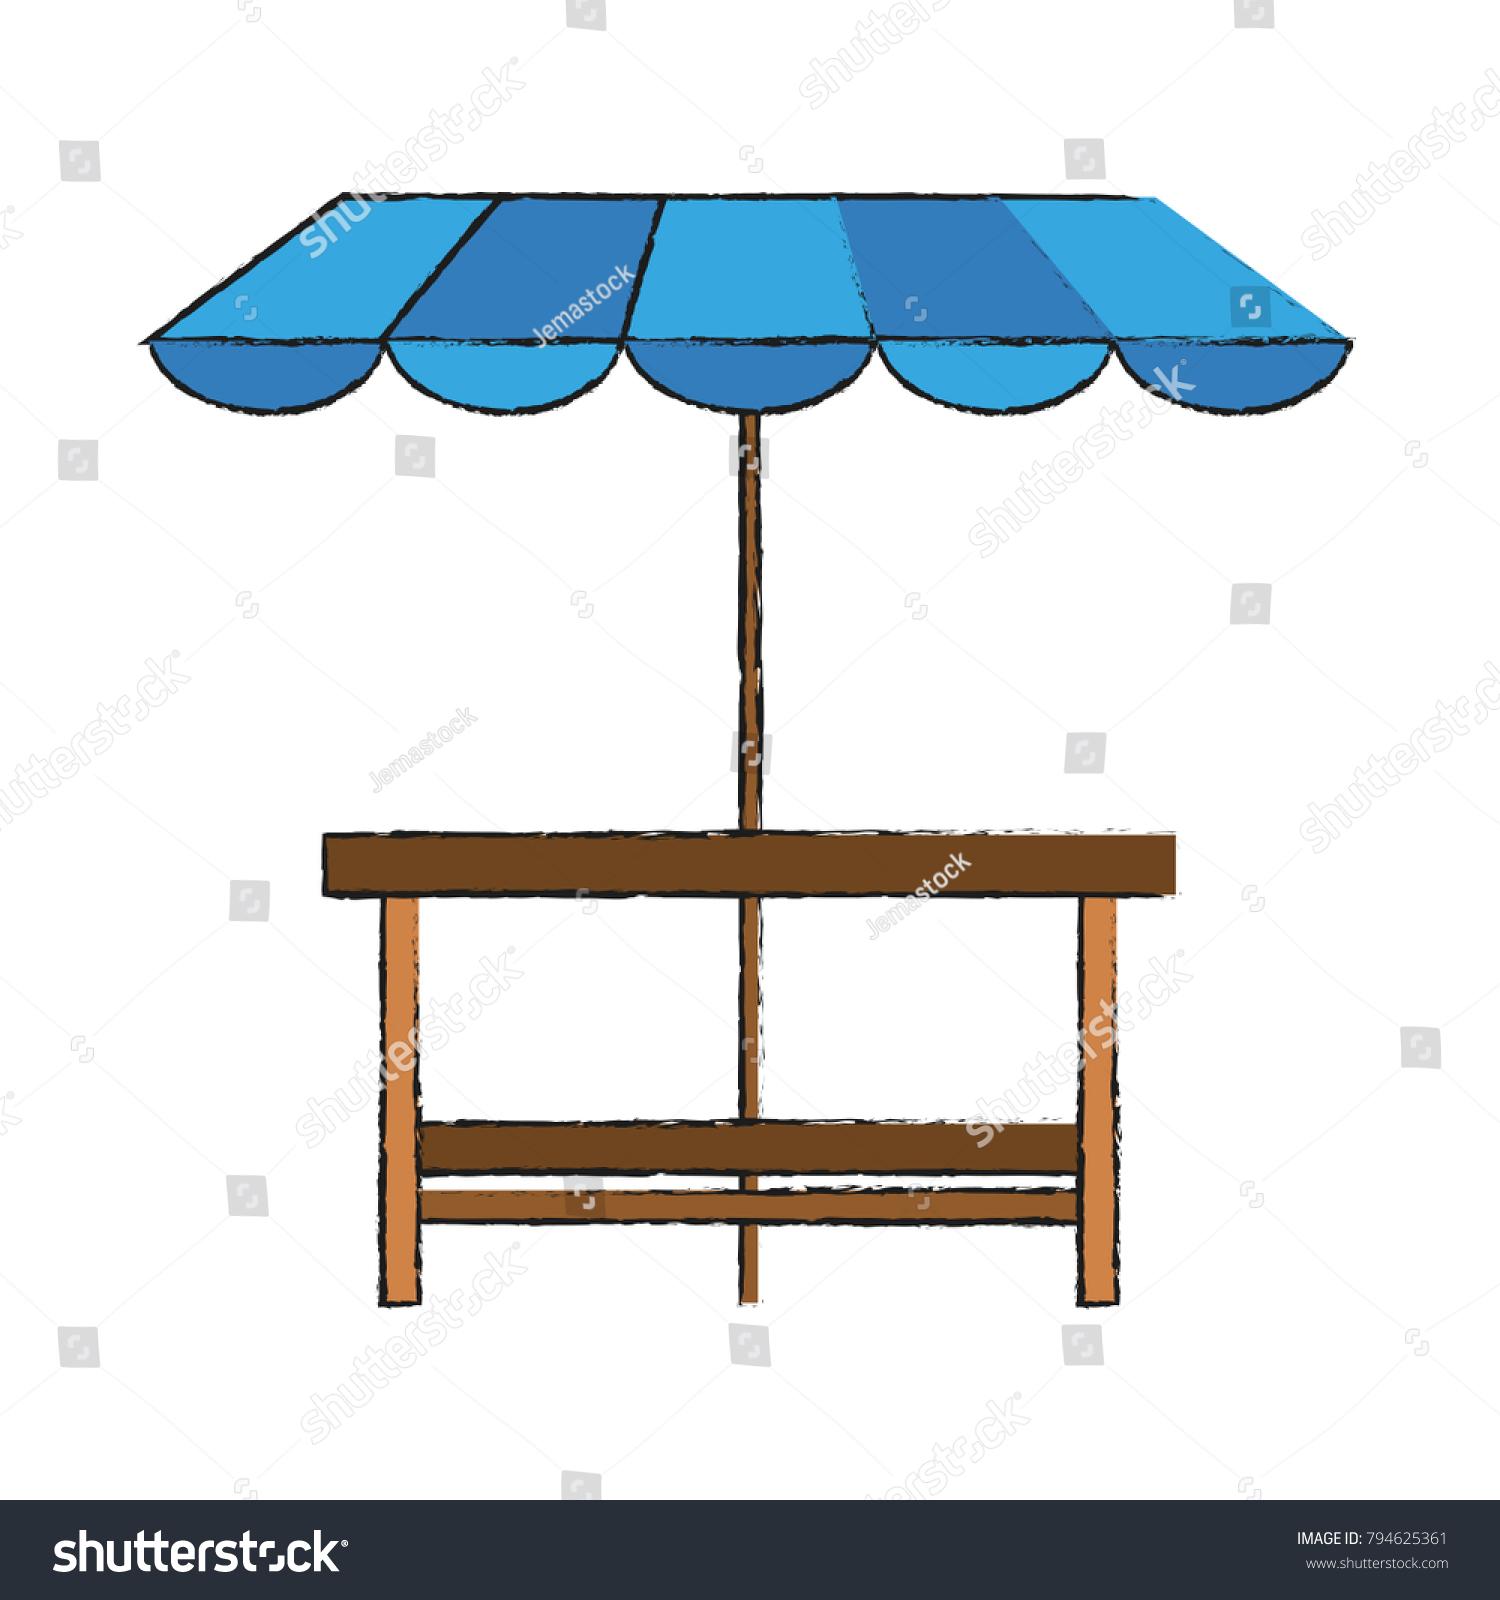 Wooden Table Patio Umbrella Stock Vector Shutterstock